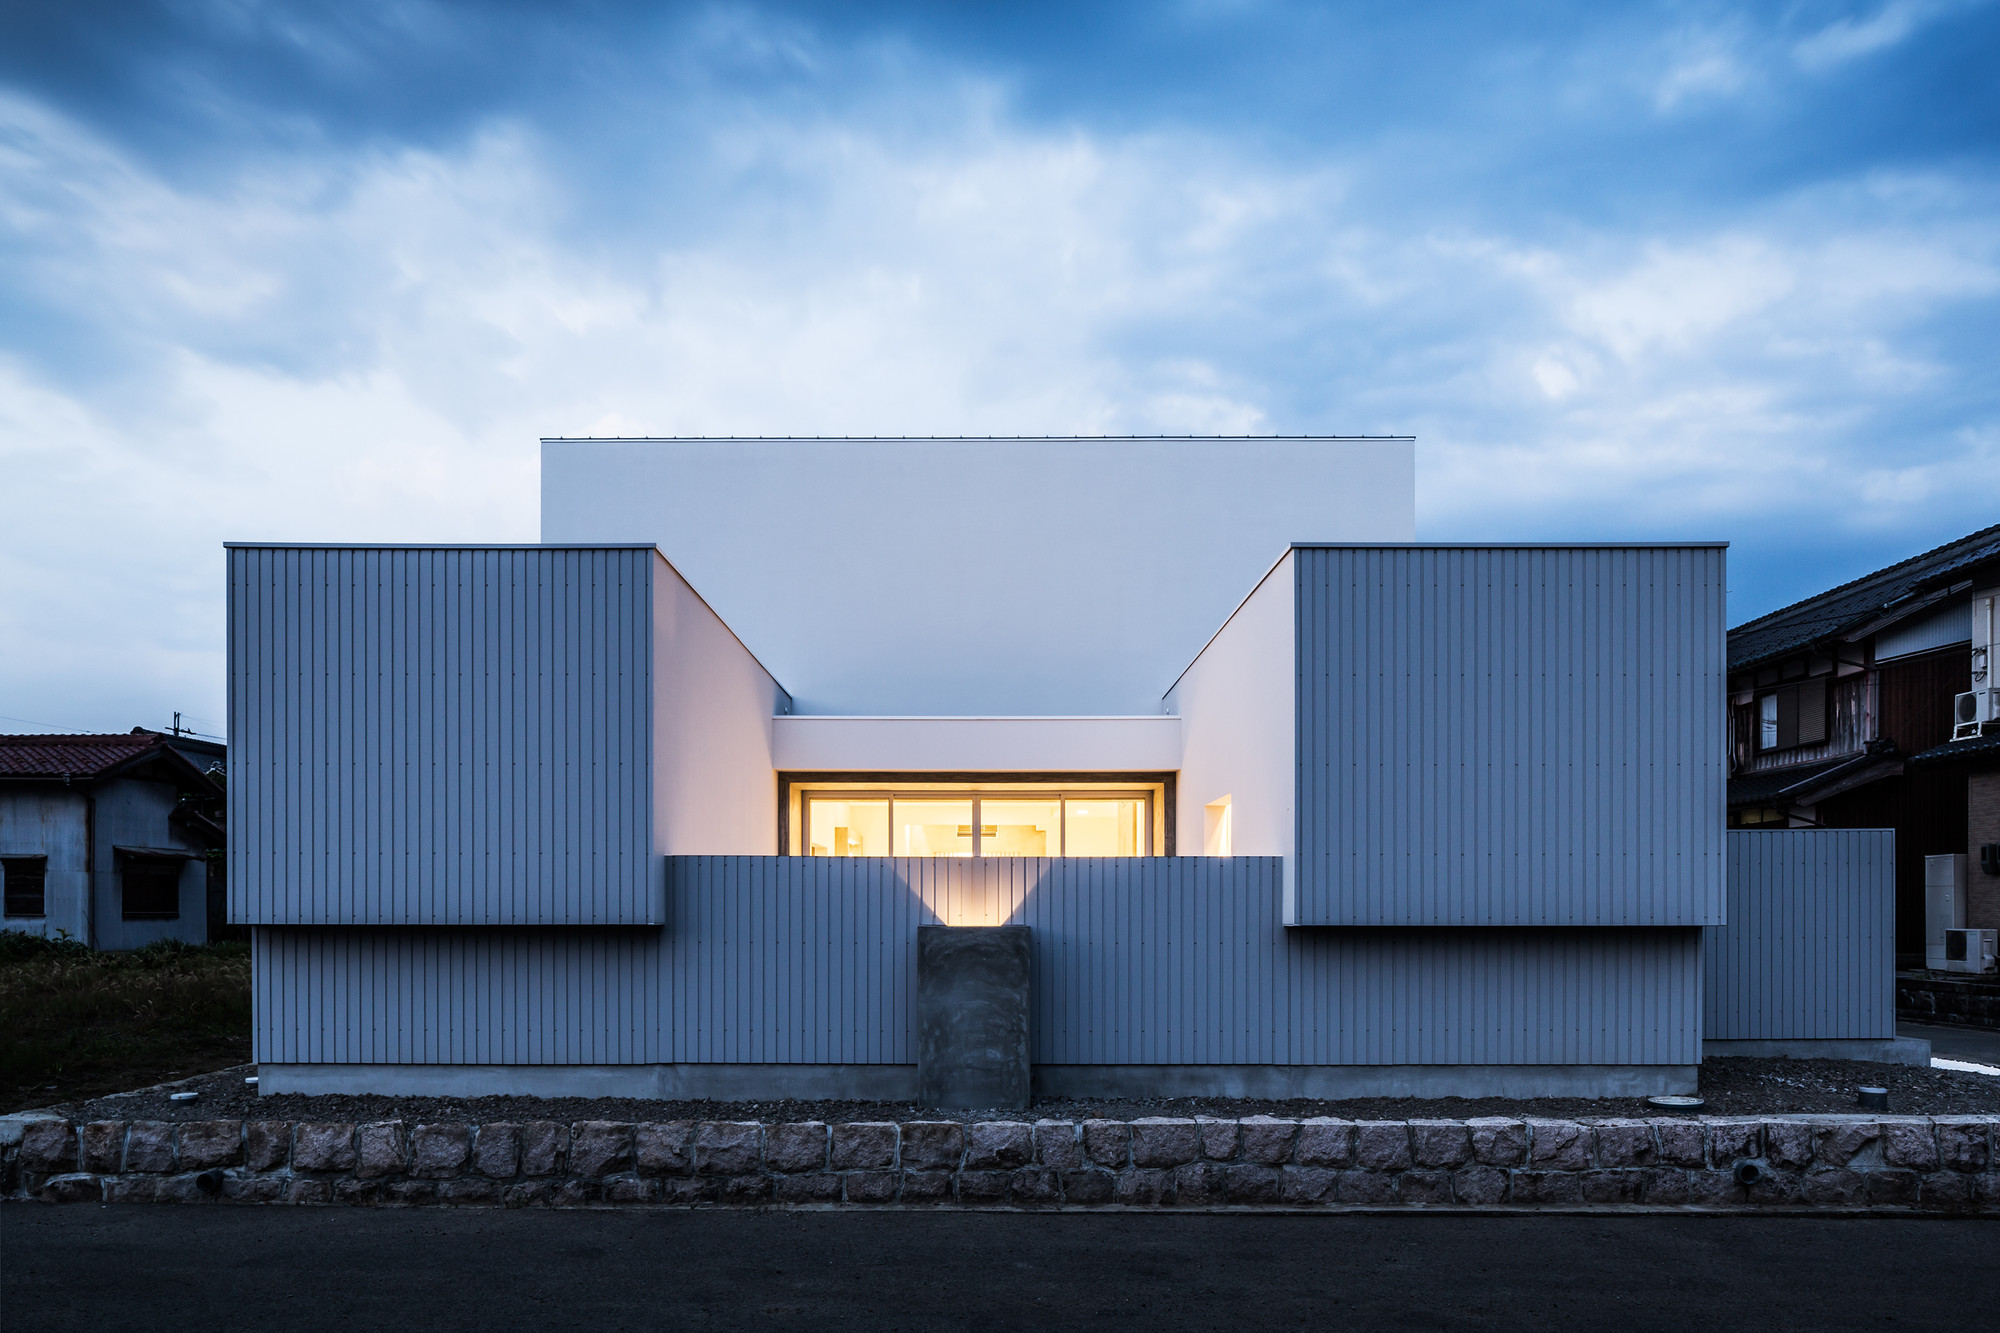 Courtyard House / FORM   Kouichi Kimura Architects, © Yoshihiro Asada